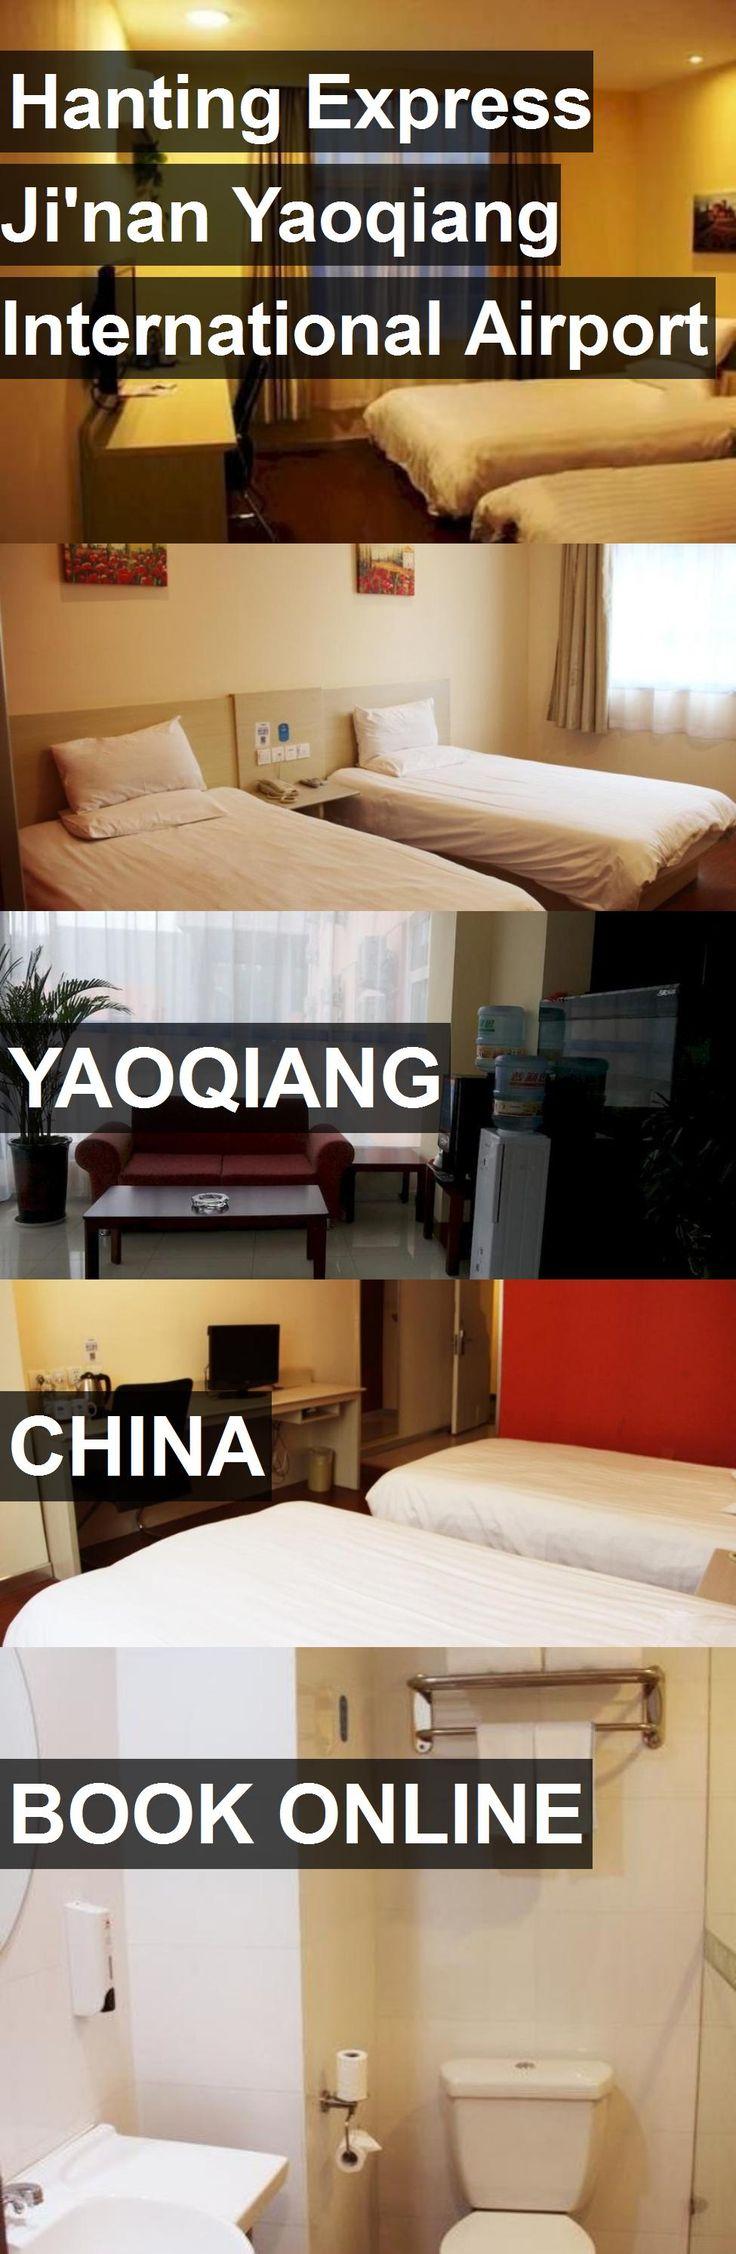 Hotel Hanting Express Ji'nan Yaoqiang International Airport in Yaoqiang, China. For more information, photos, reviews and best prices please follow the link. #China #Yaoqiang #travel #vacation #hotel